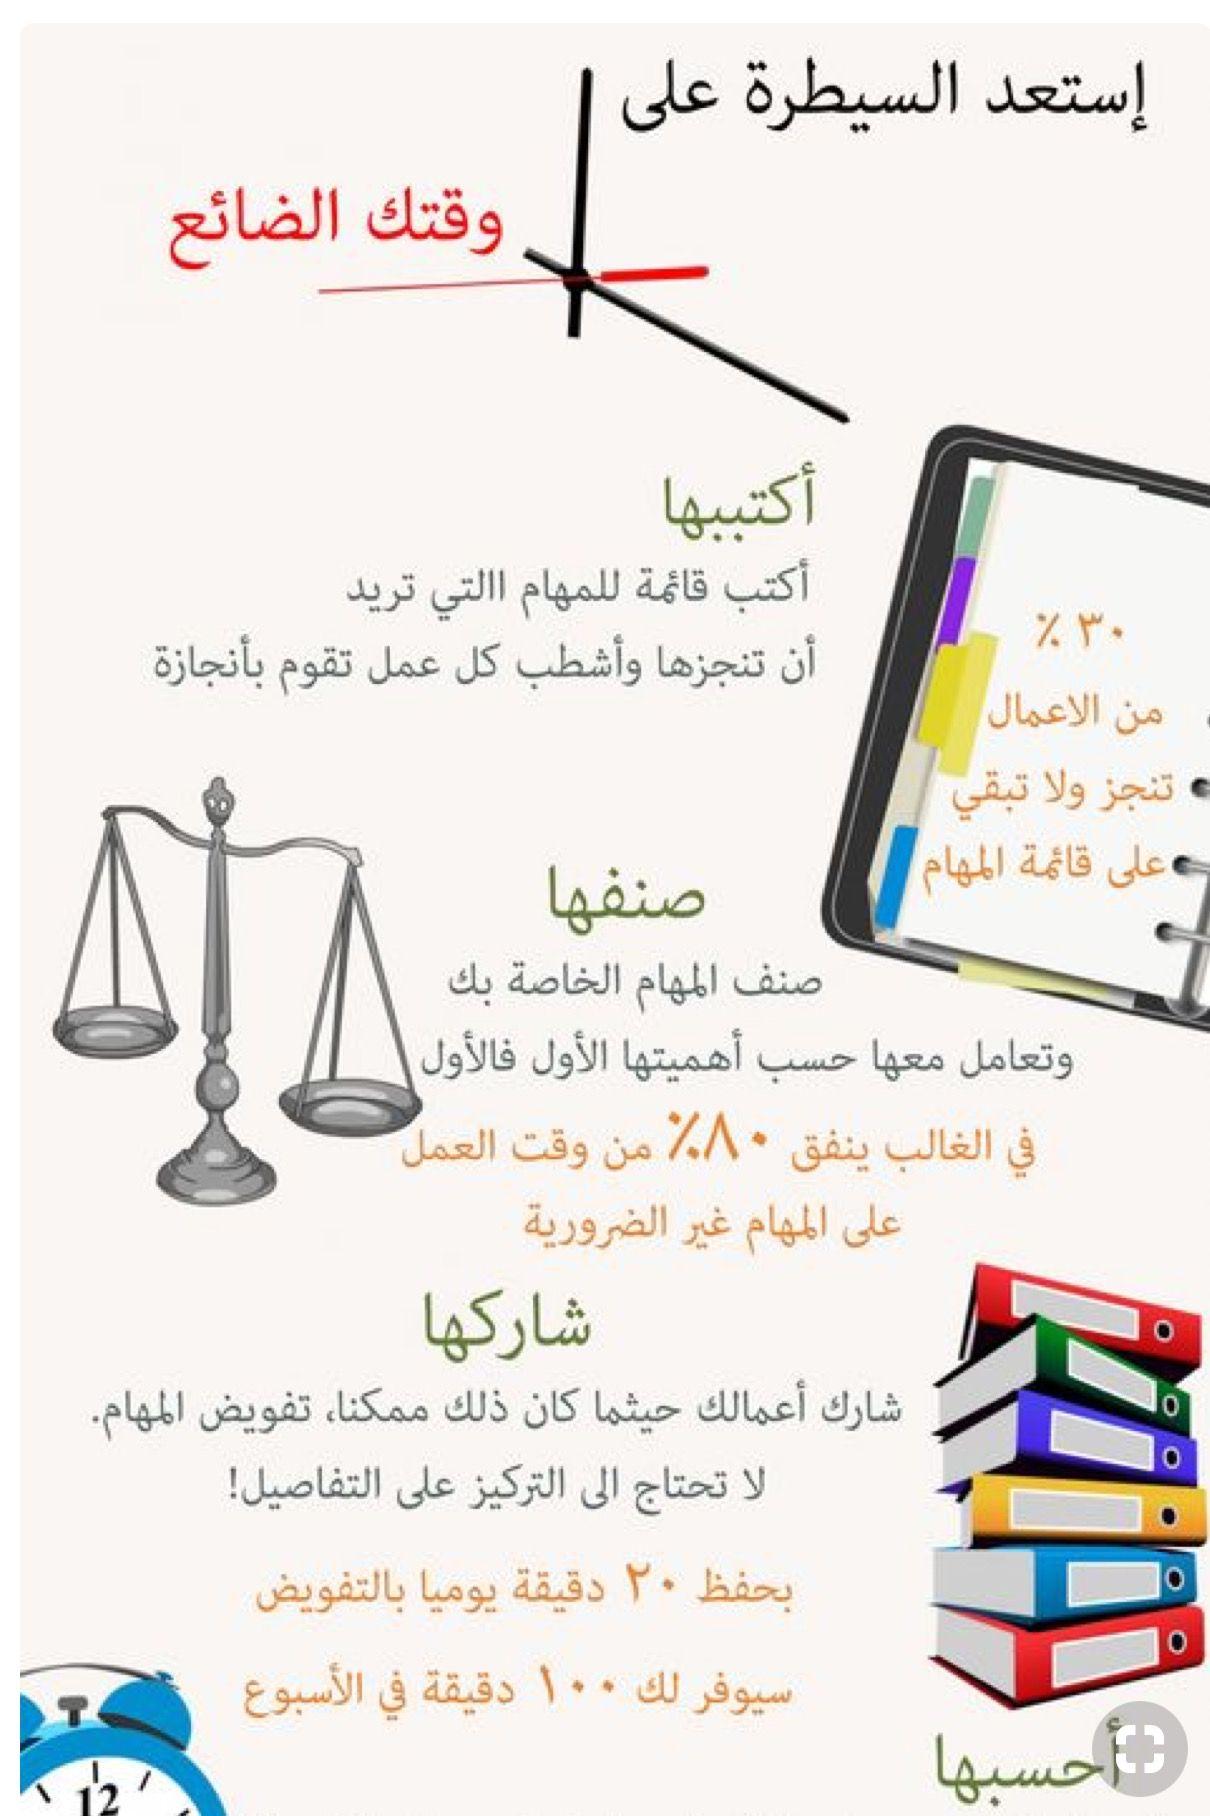 Pin By Nassim On تطوير الذات Life Skills Activities Life Planner Organization Study Skills